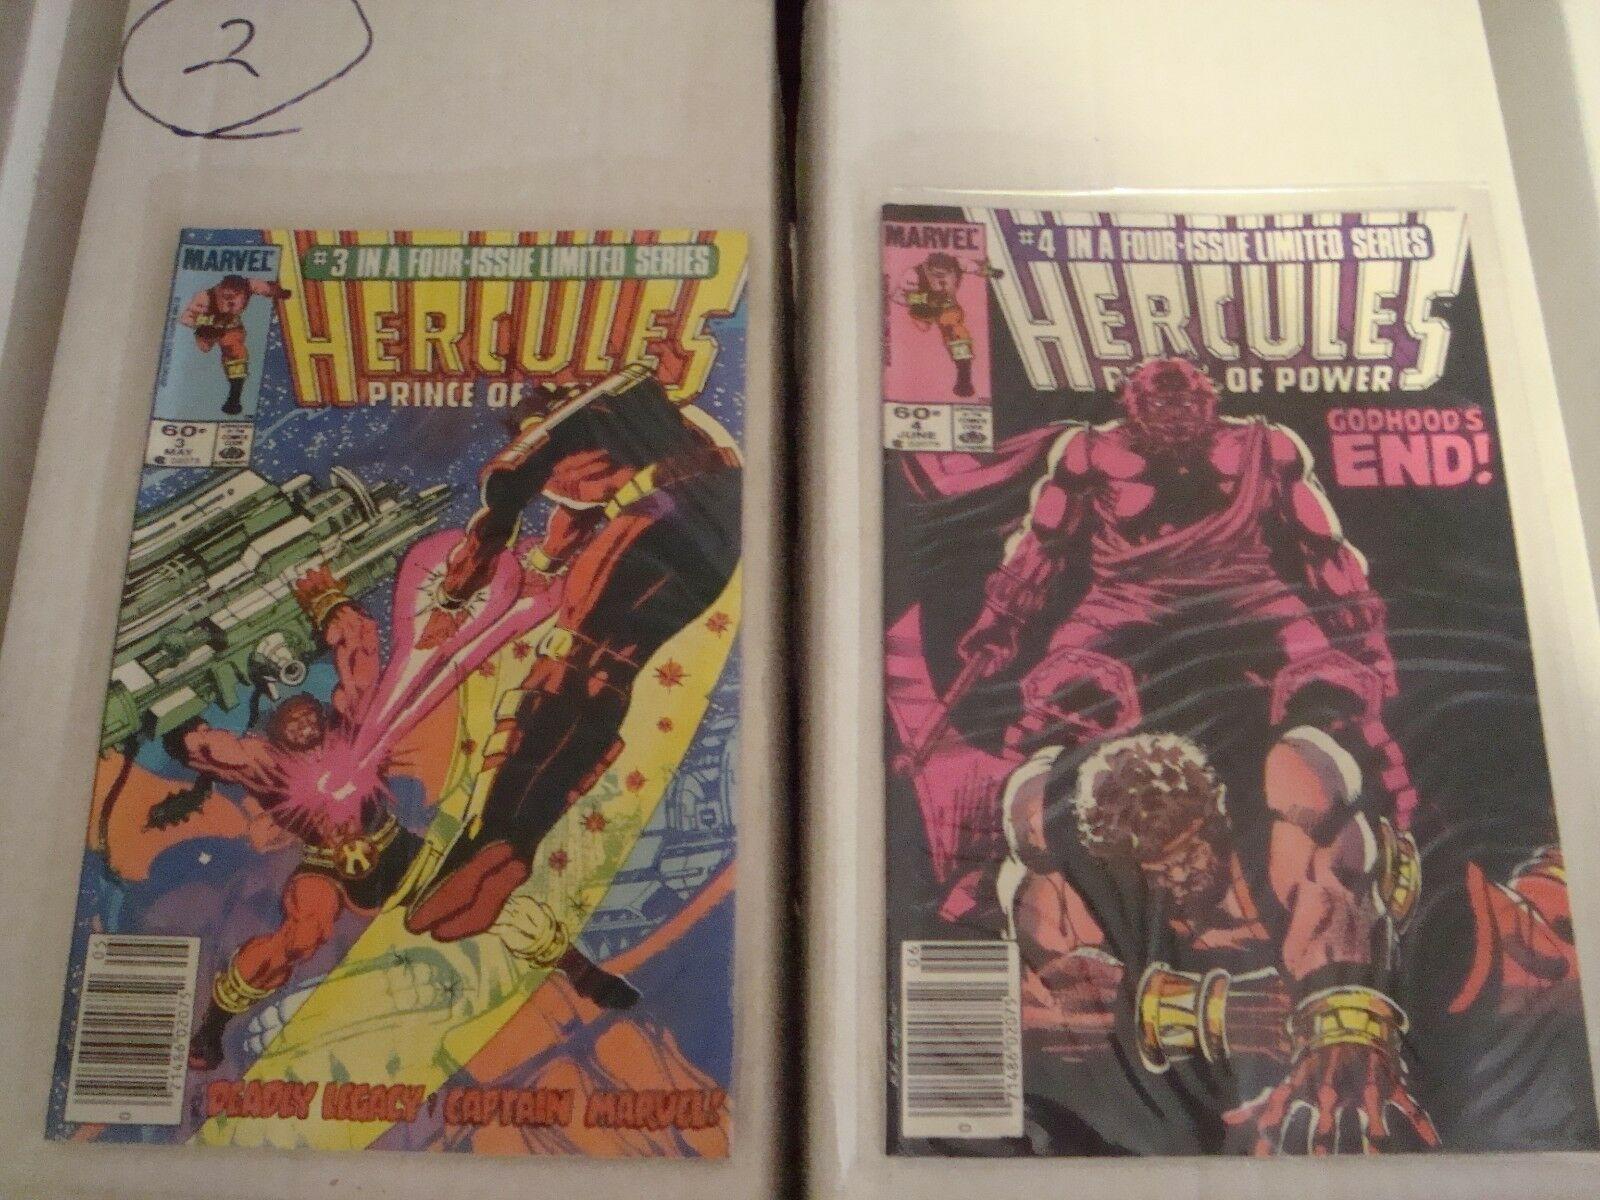 Hercules Prince of Power Original Marvel Comic Book Minis Series 1 - 4 From 1984